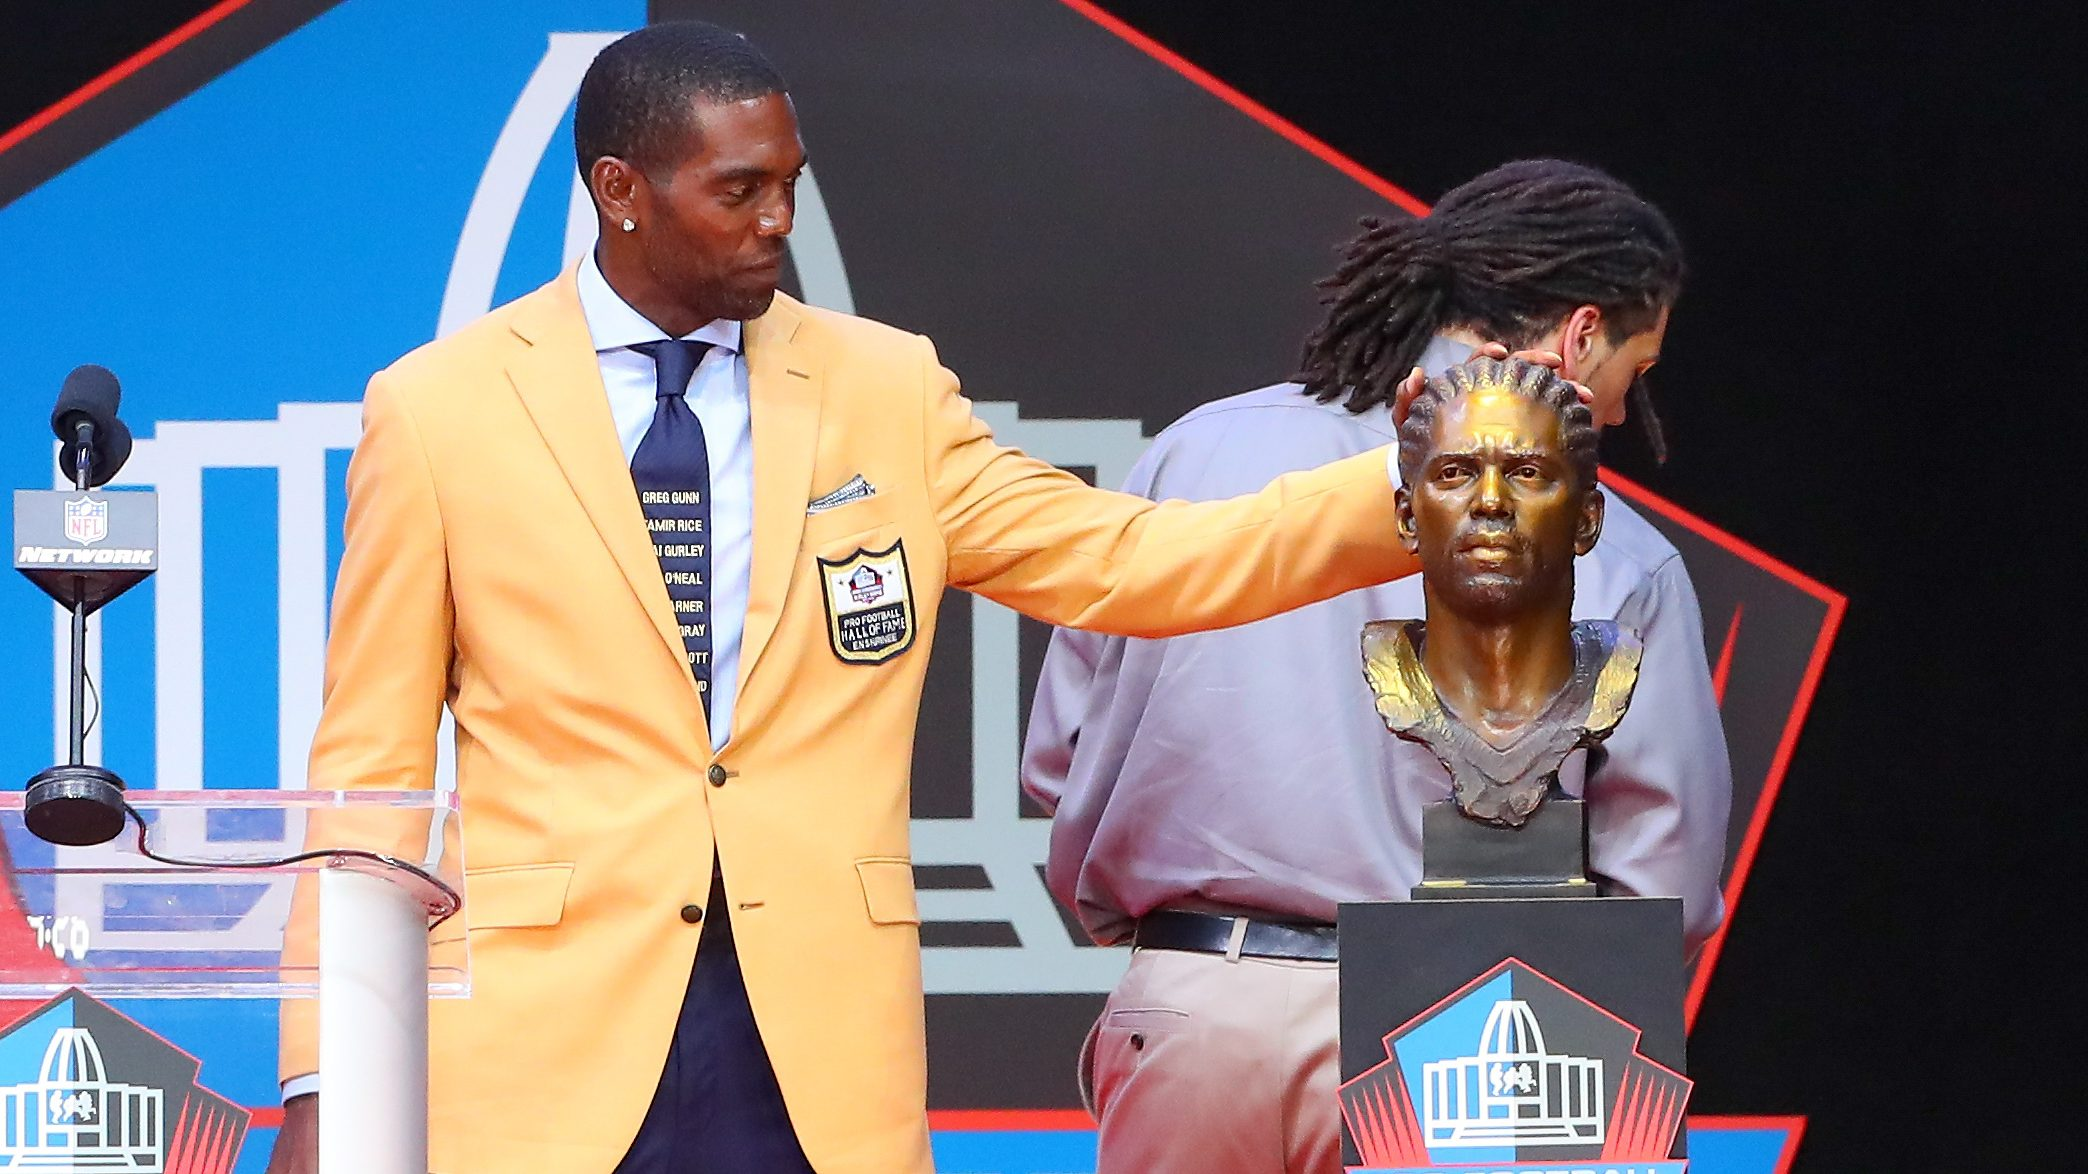 NFL: AUG 04 Hall of Fame Enshrinement Ceremony